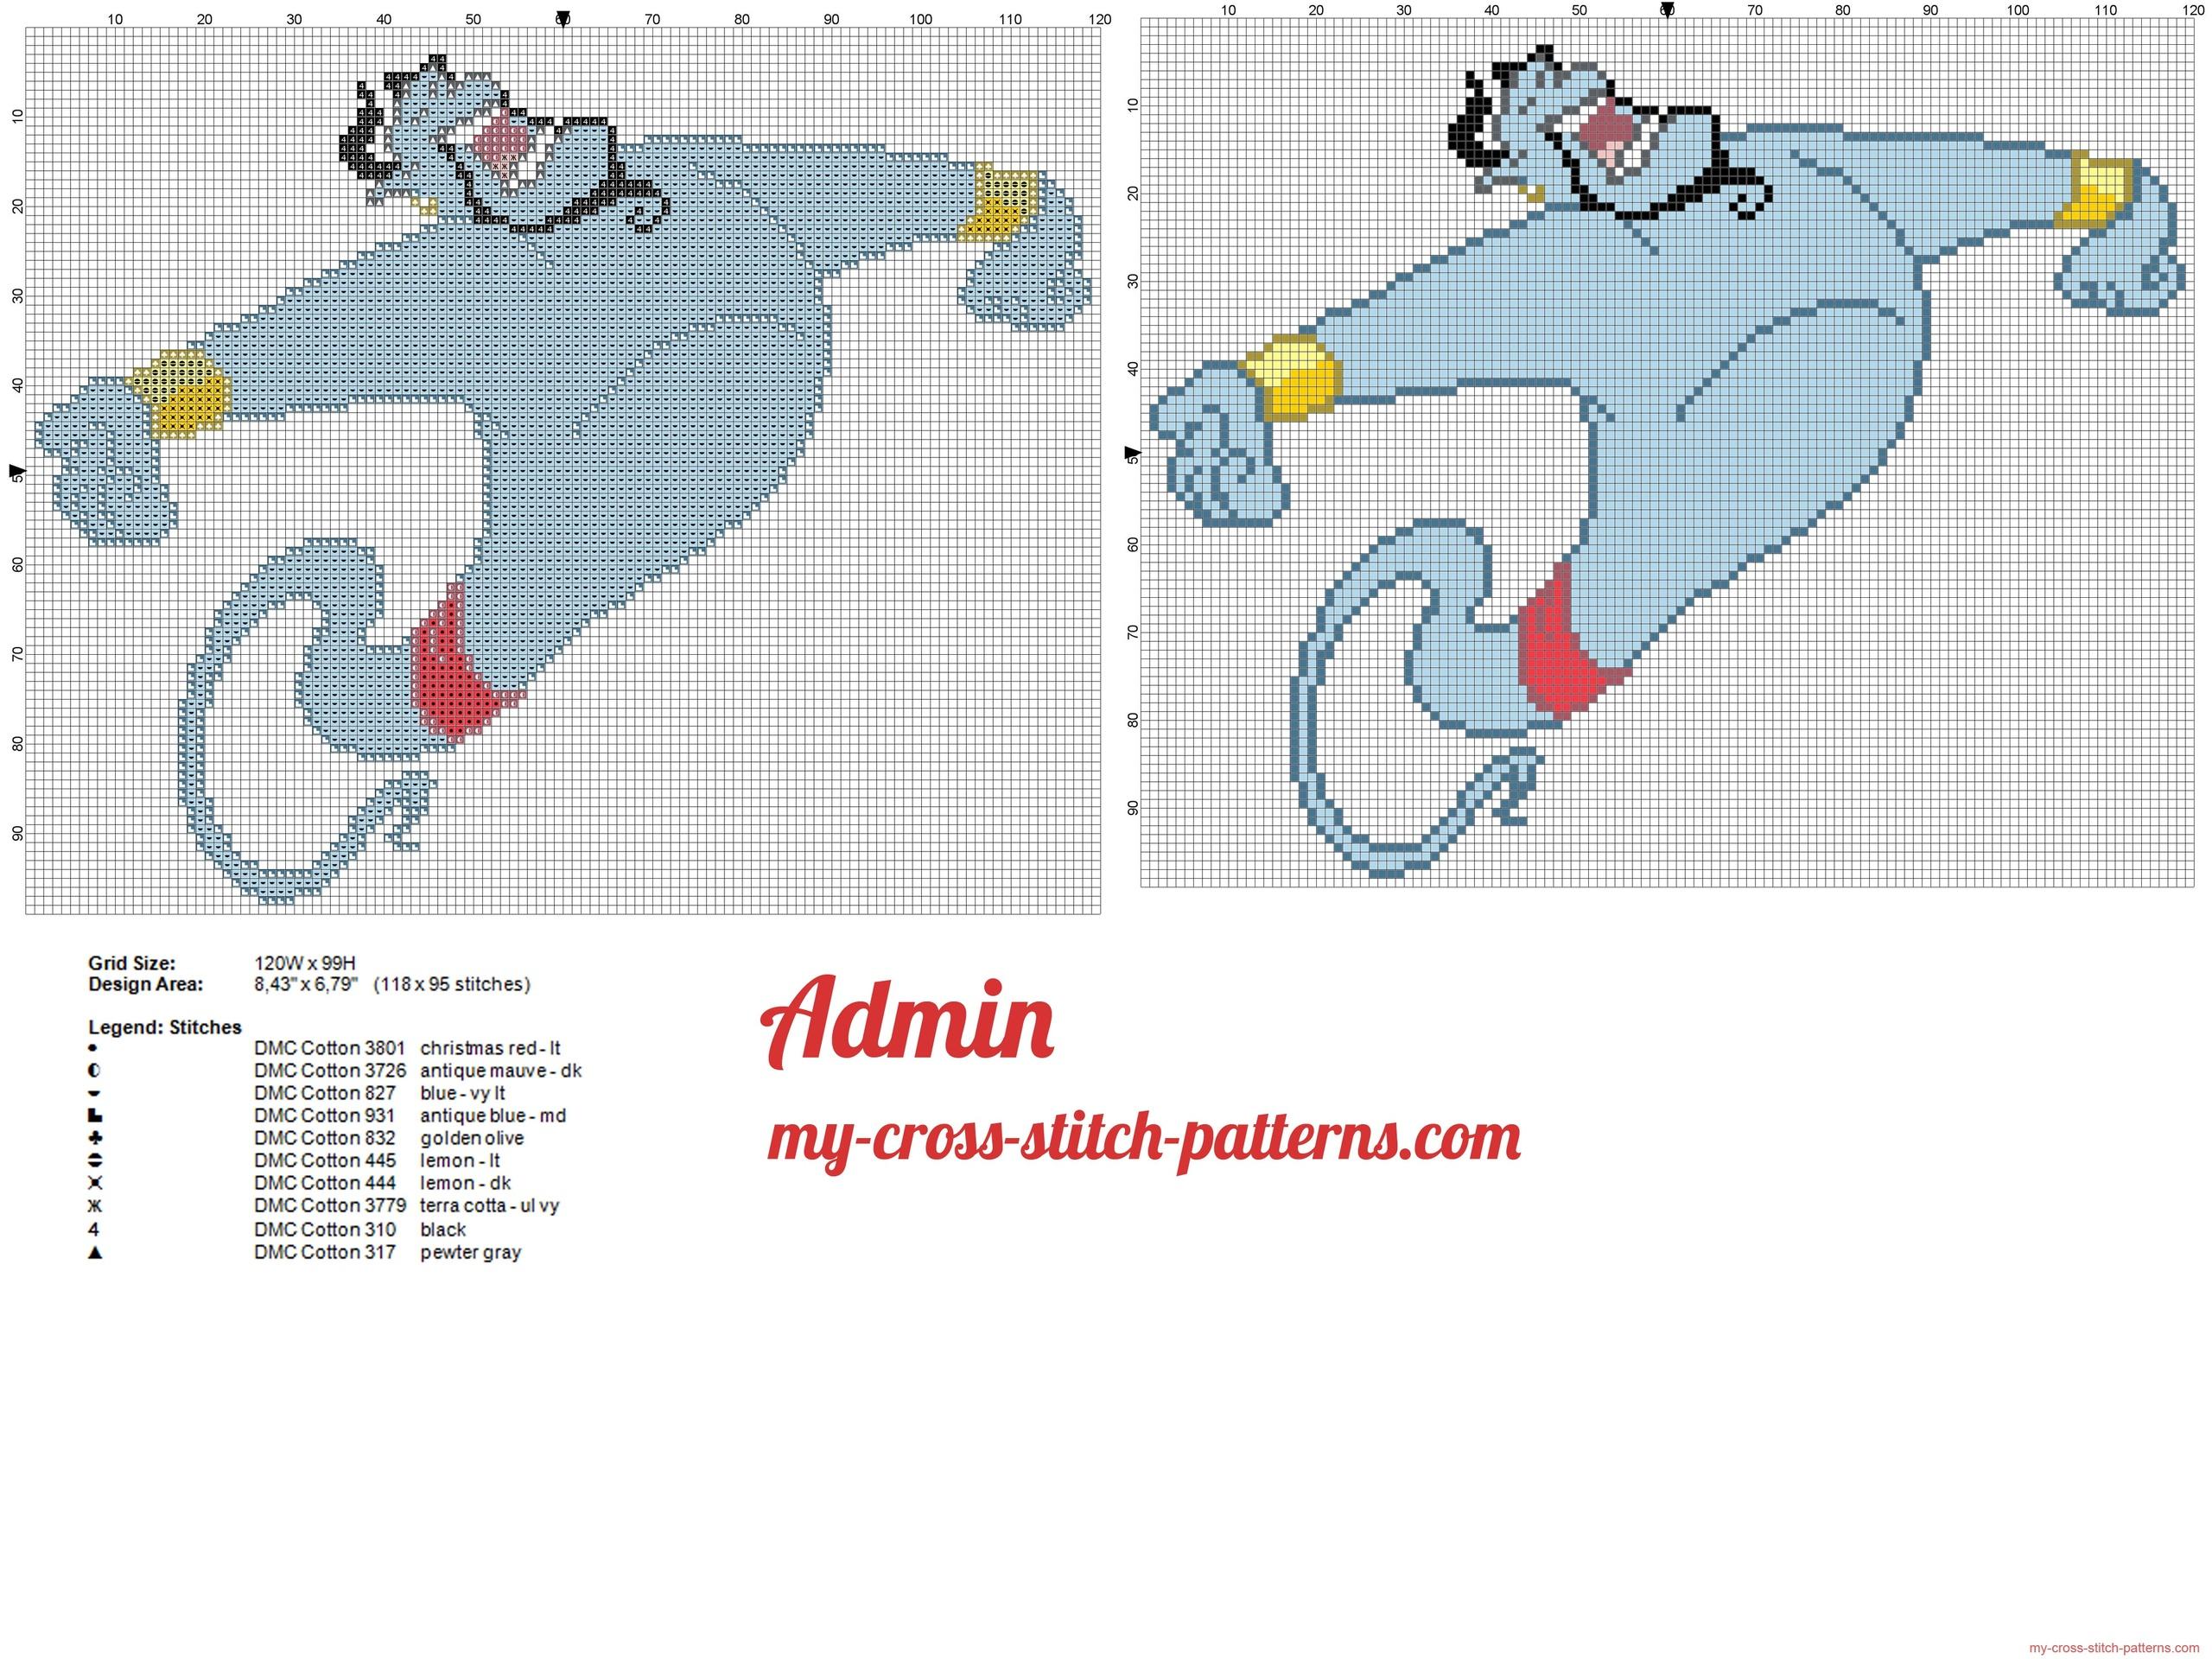 the_genie_of_aladdin_cross_stitch_pattern